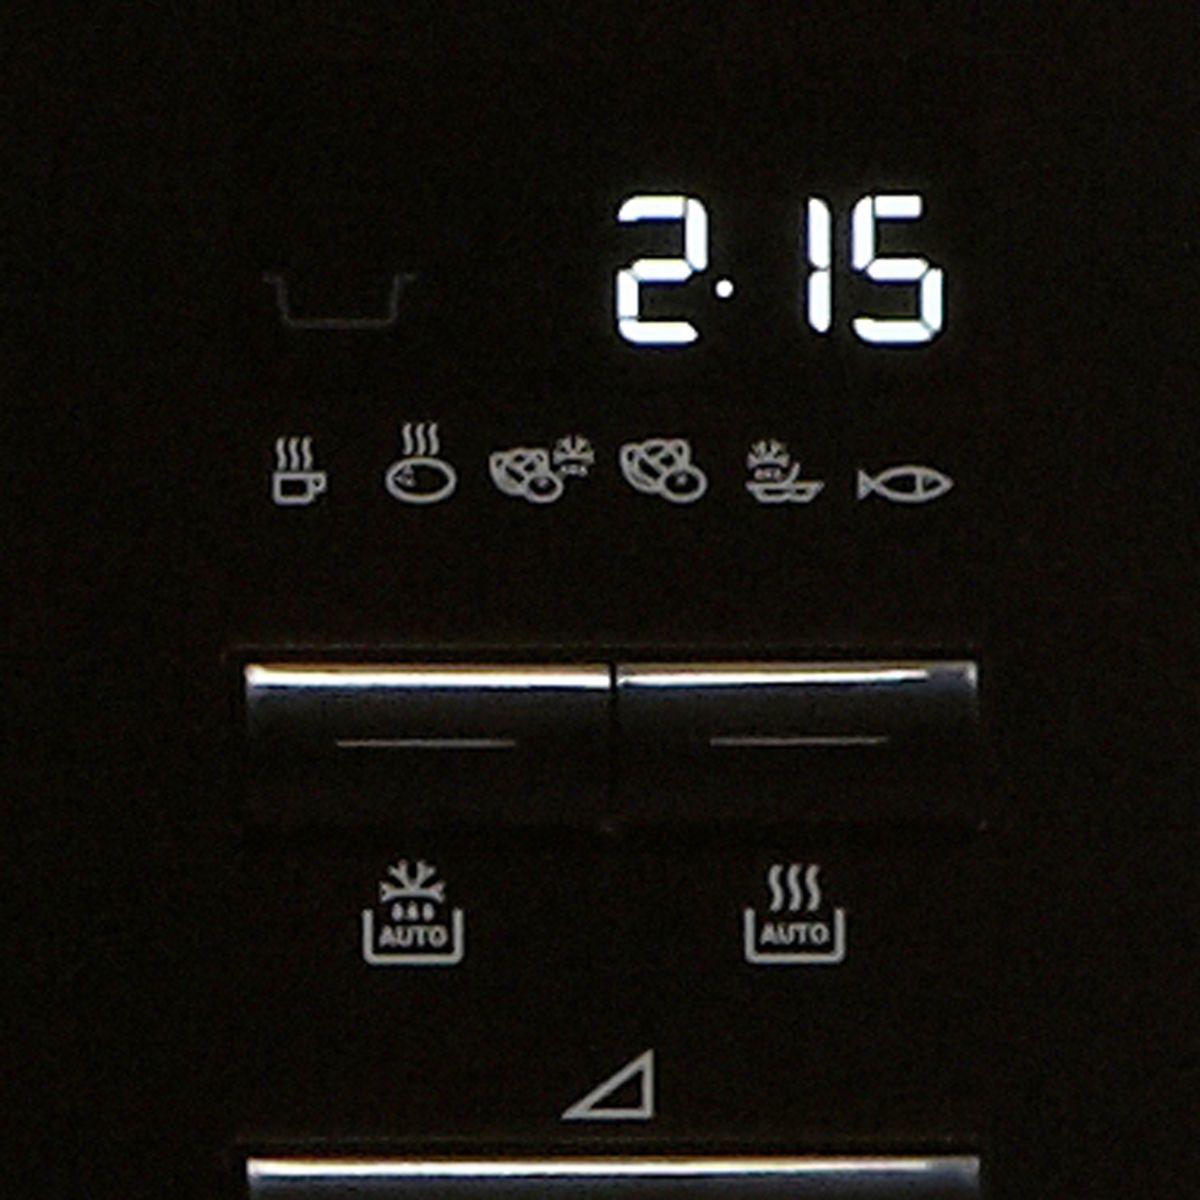 Micro-onde encastrable electrolux ems26004ox - livraison offerte : code liv (photo)